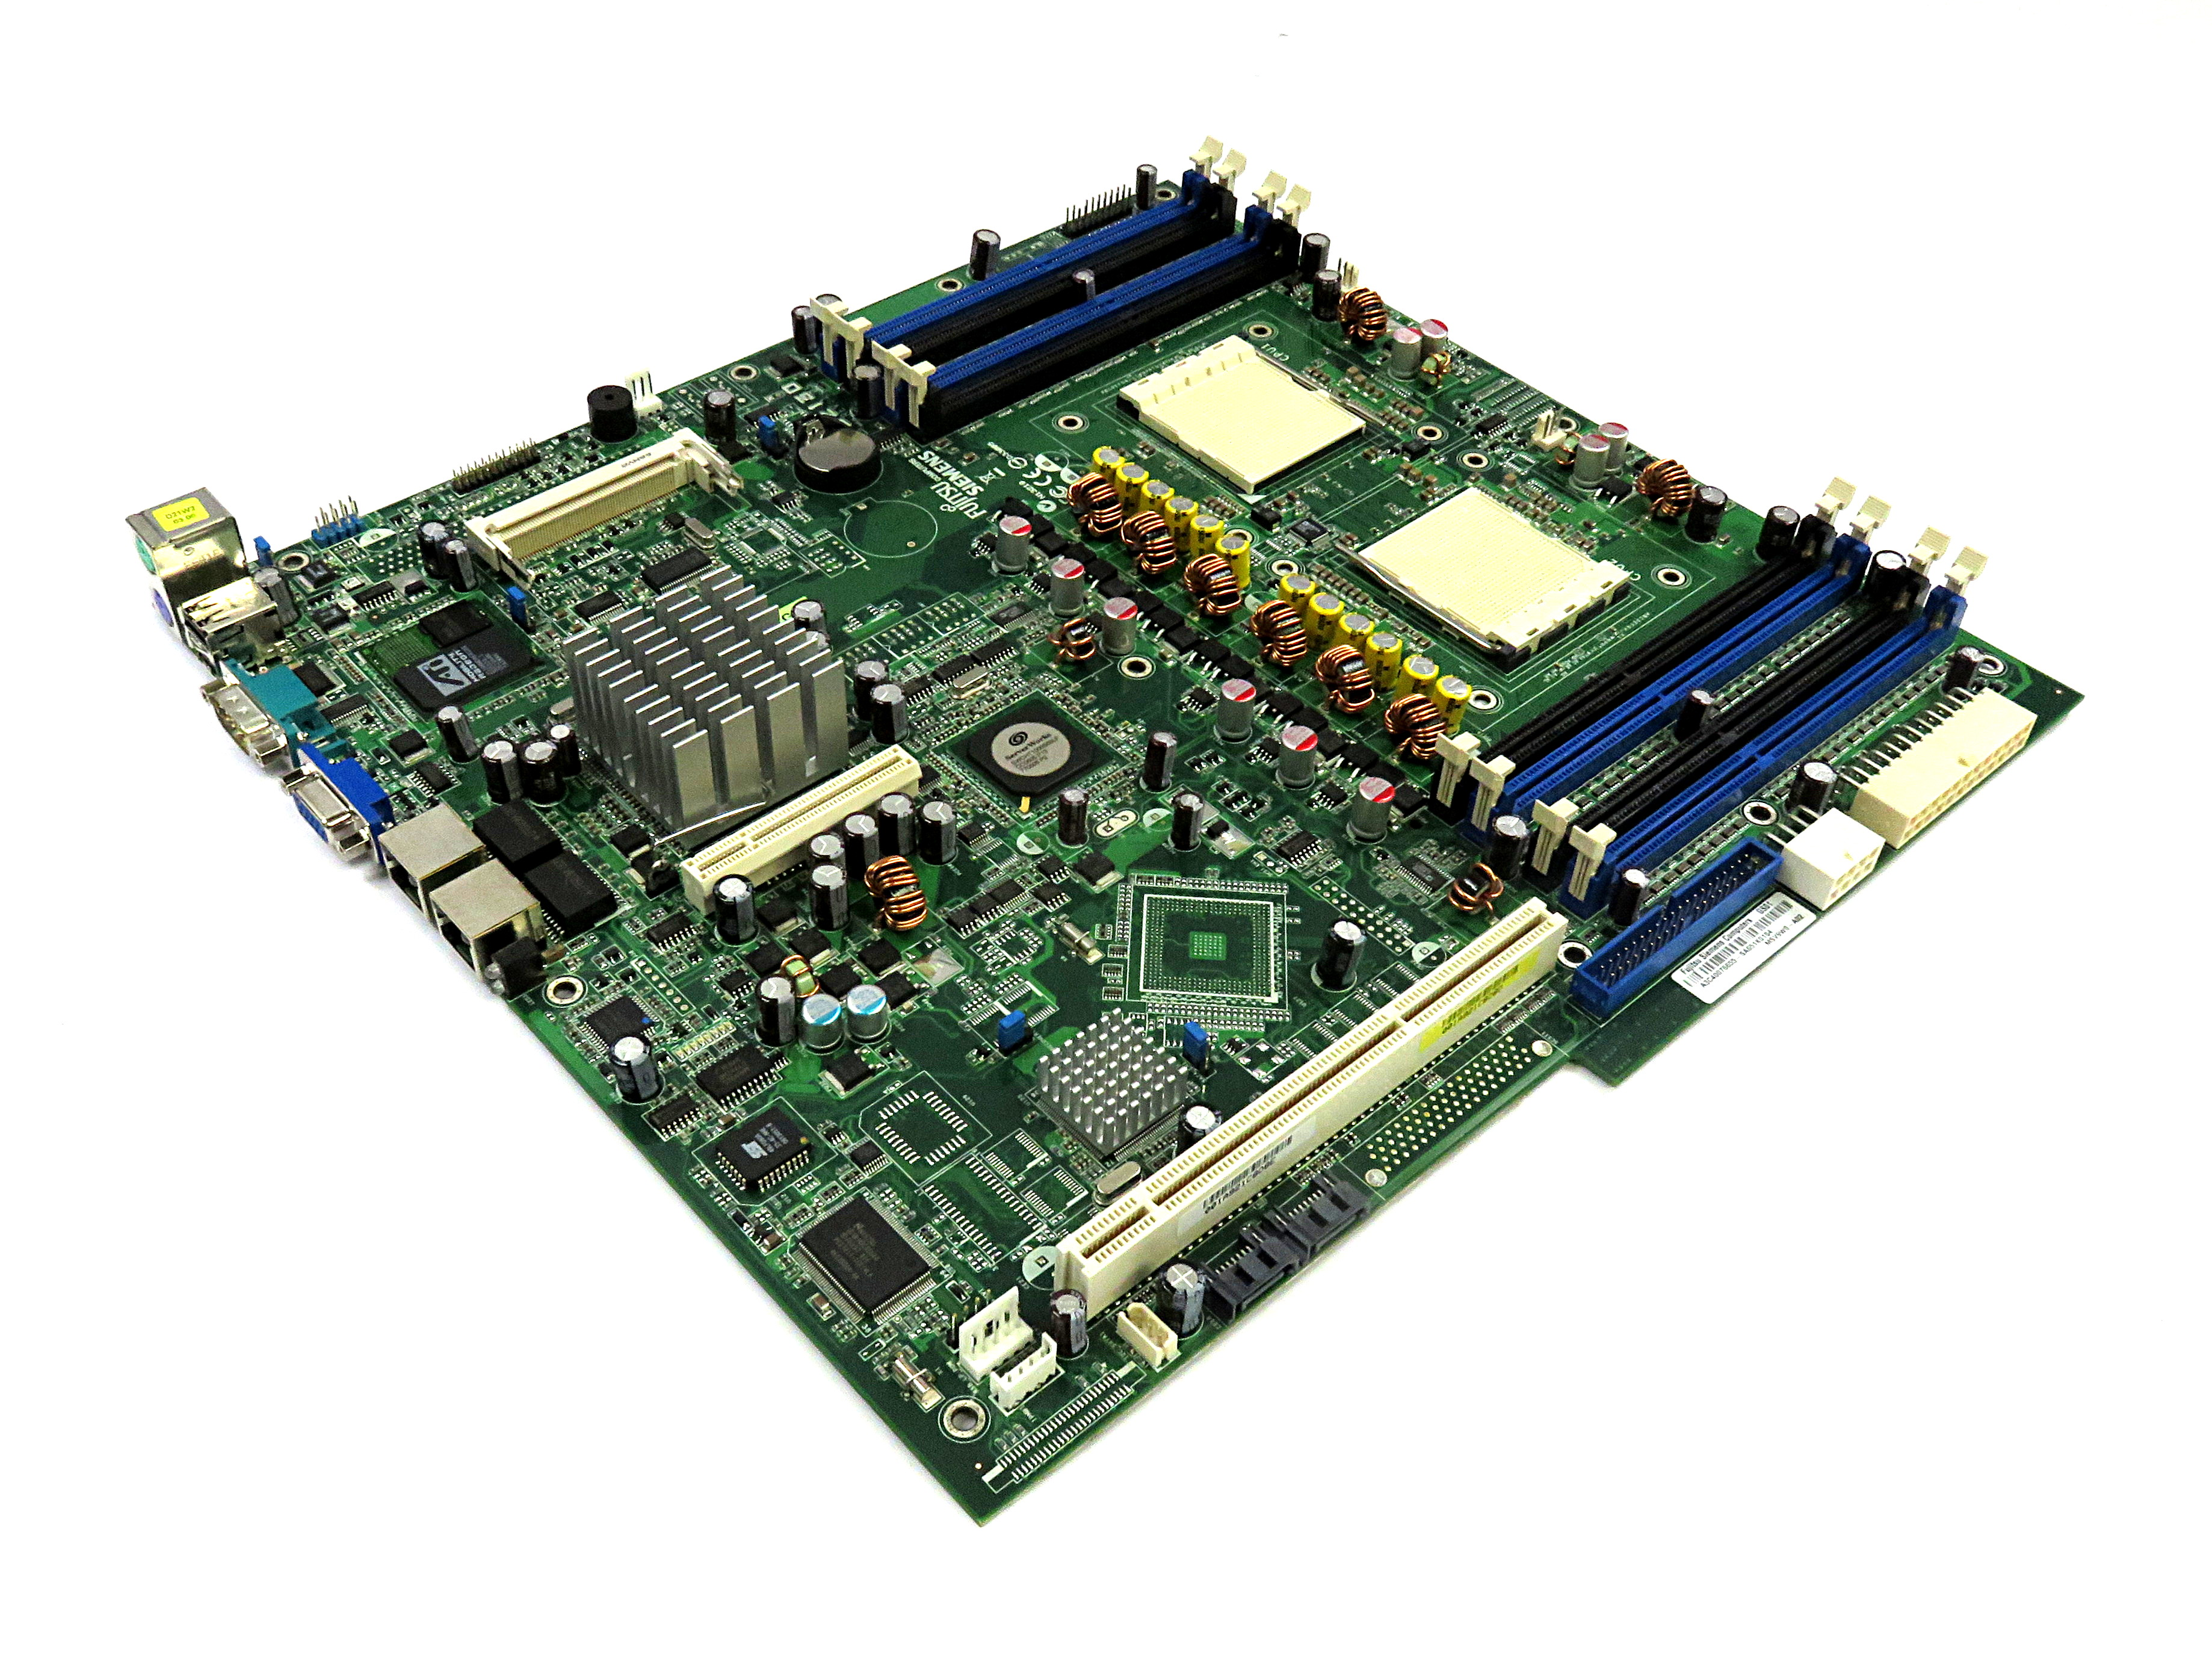 Detalles de Fujitsu Siemens A3C40076655 MSV9W0-A02 Dual Socket 940 placa  base D2130 REV:1 05- ver título original